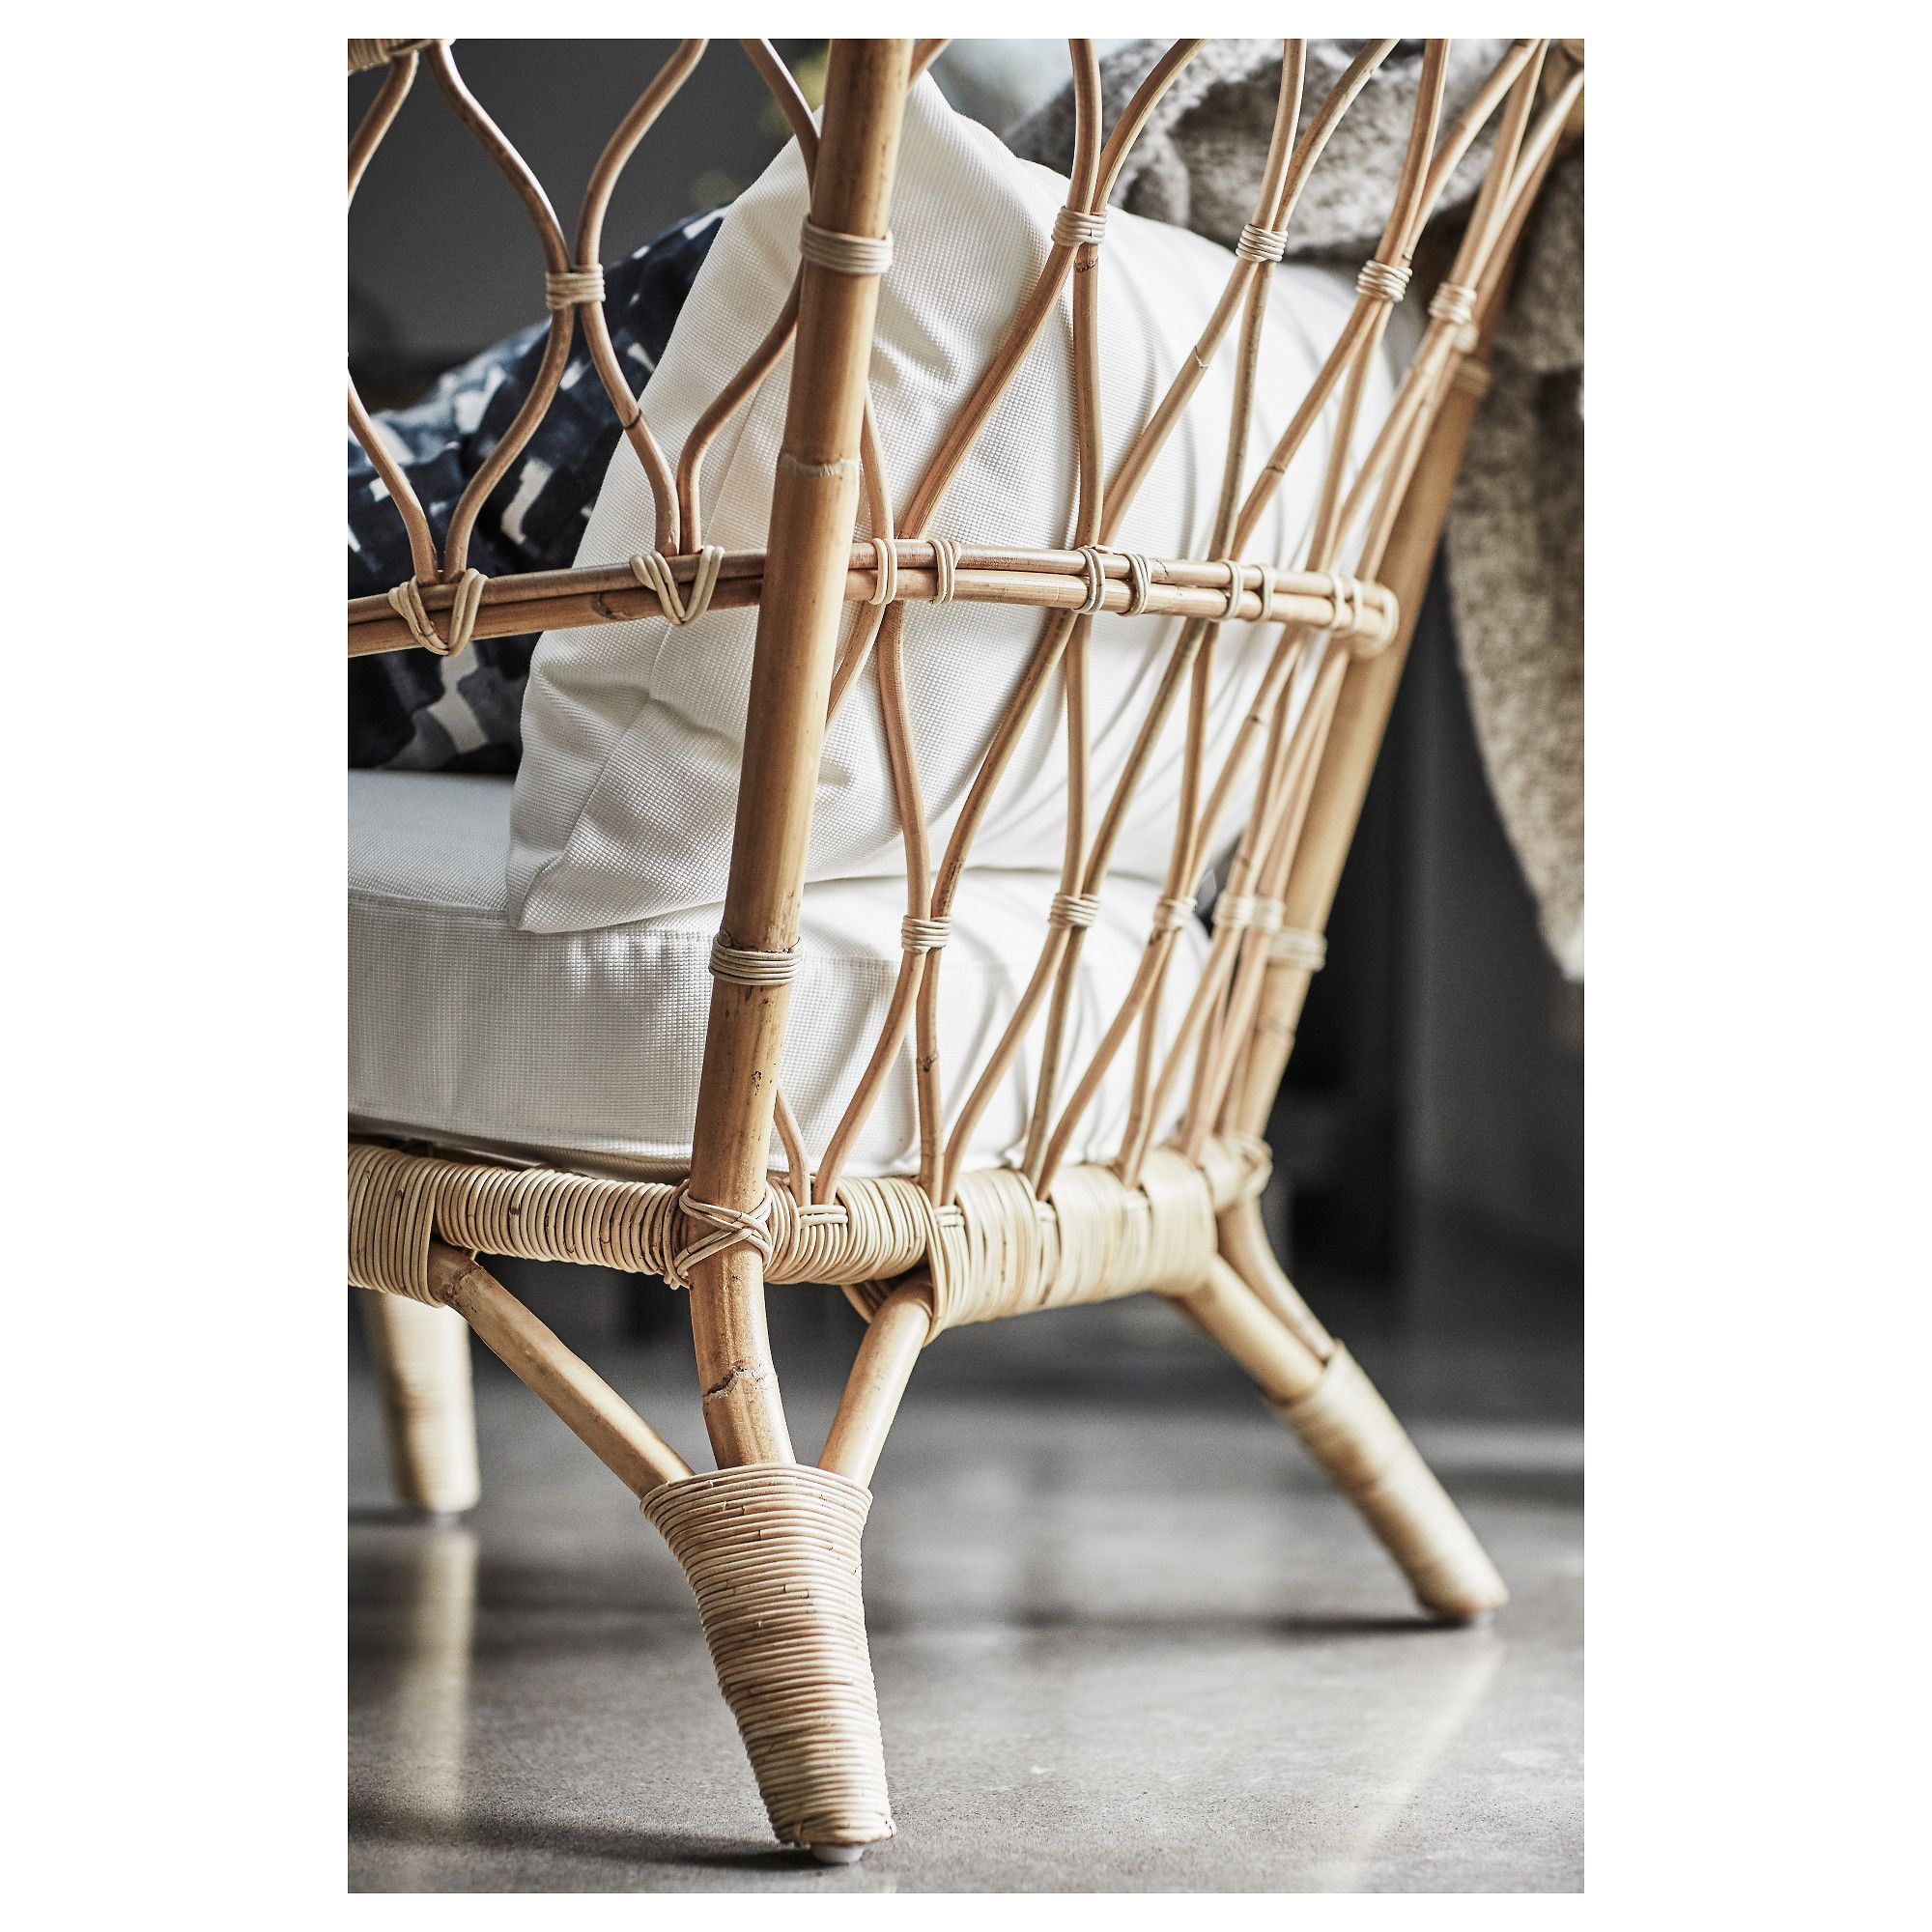 Divani In Rattan Ikea.Furniture And Home Furnishings Federe